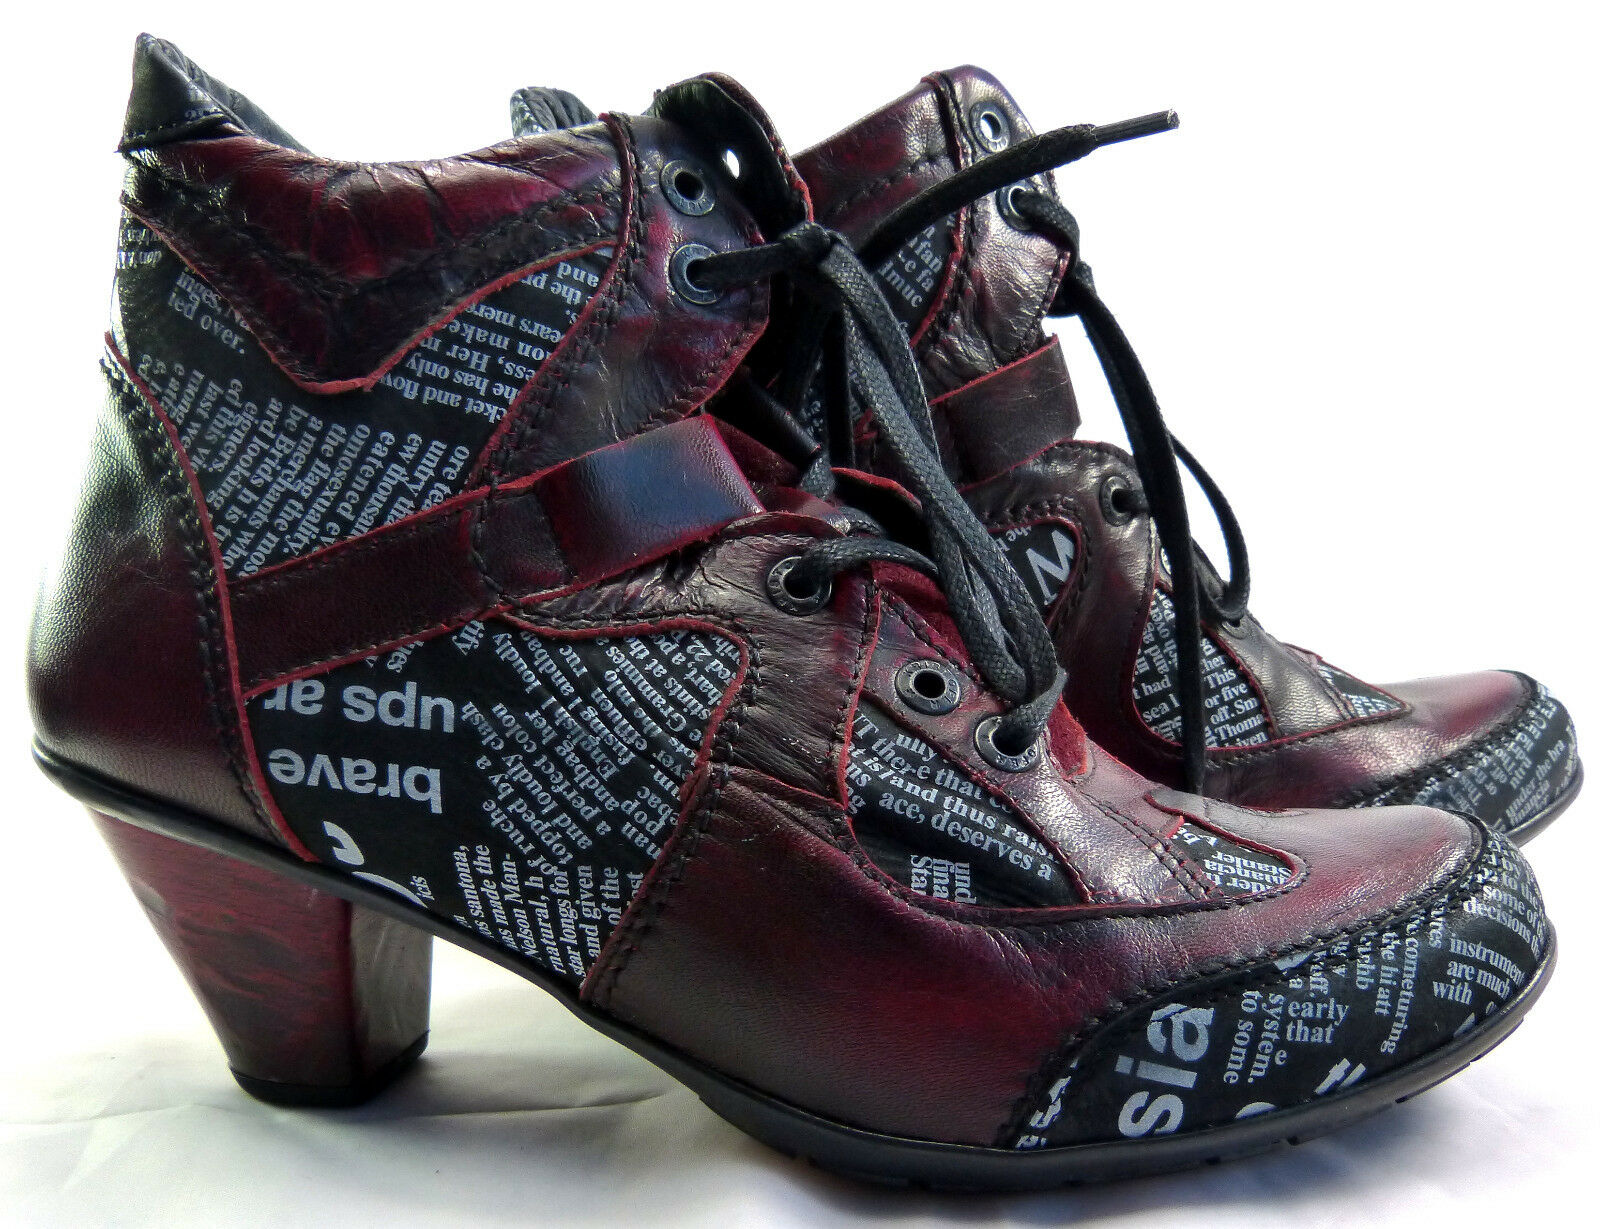 Kristofer Damen Stiefelette Gr. 40 rot bordGoldt Stiefel Stiefel Schuhe Leder neu